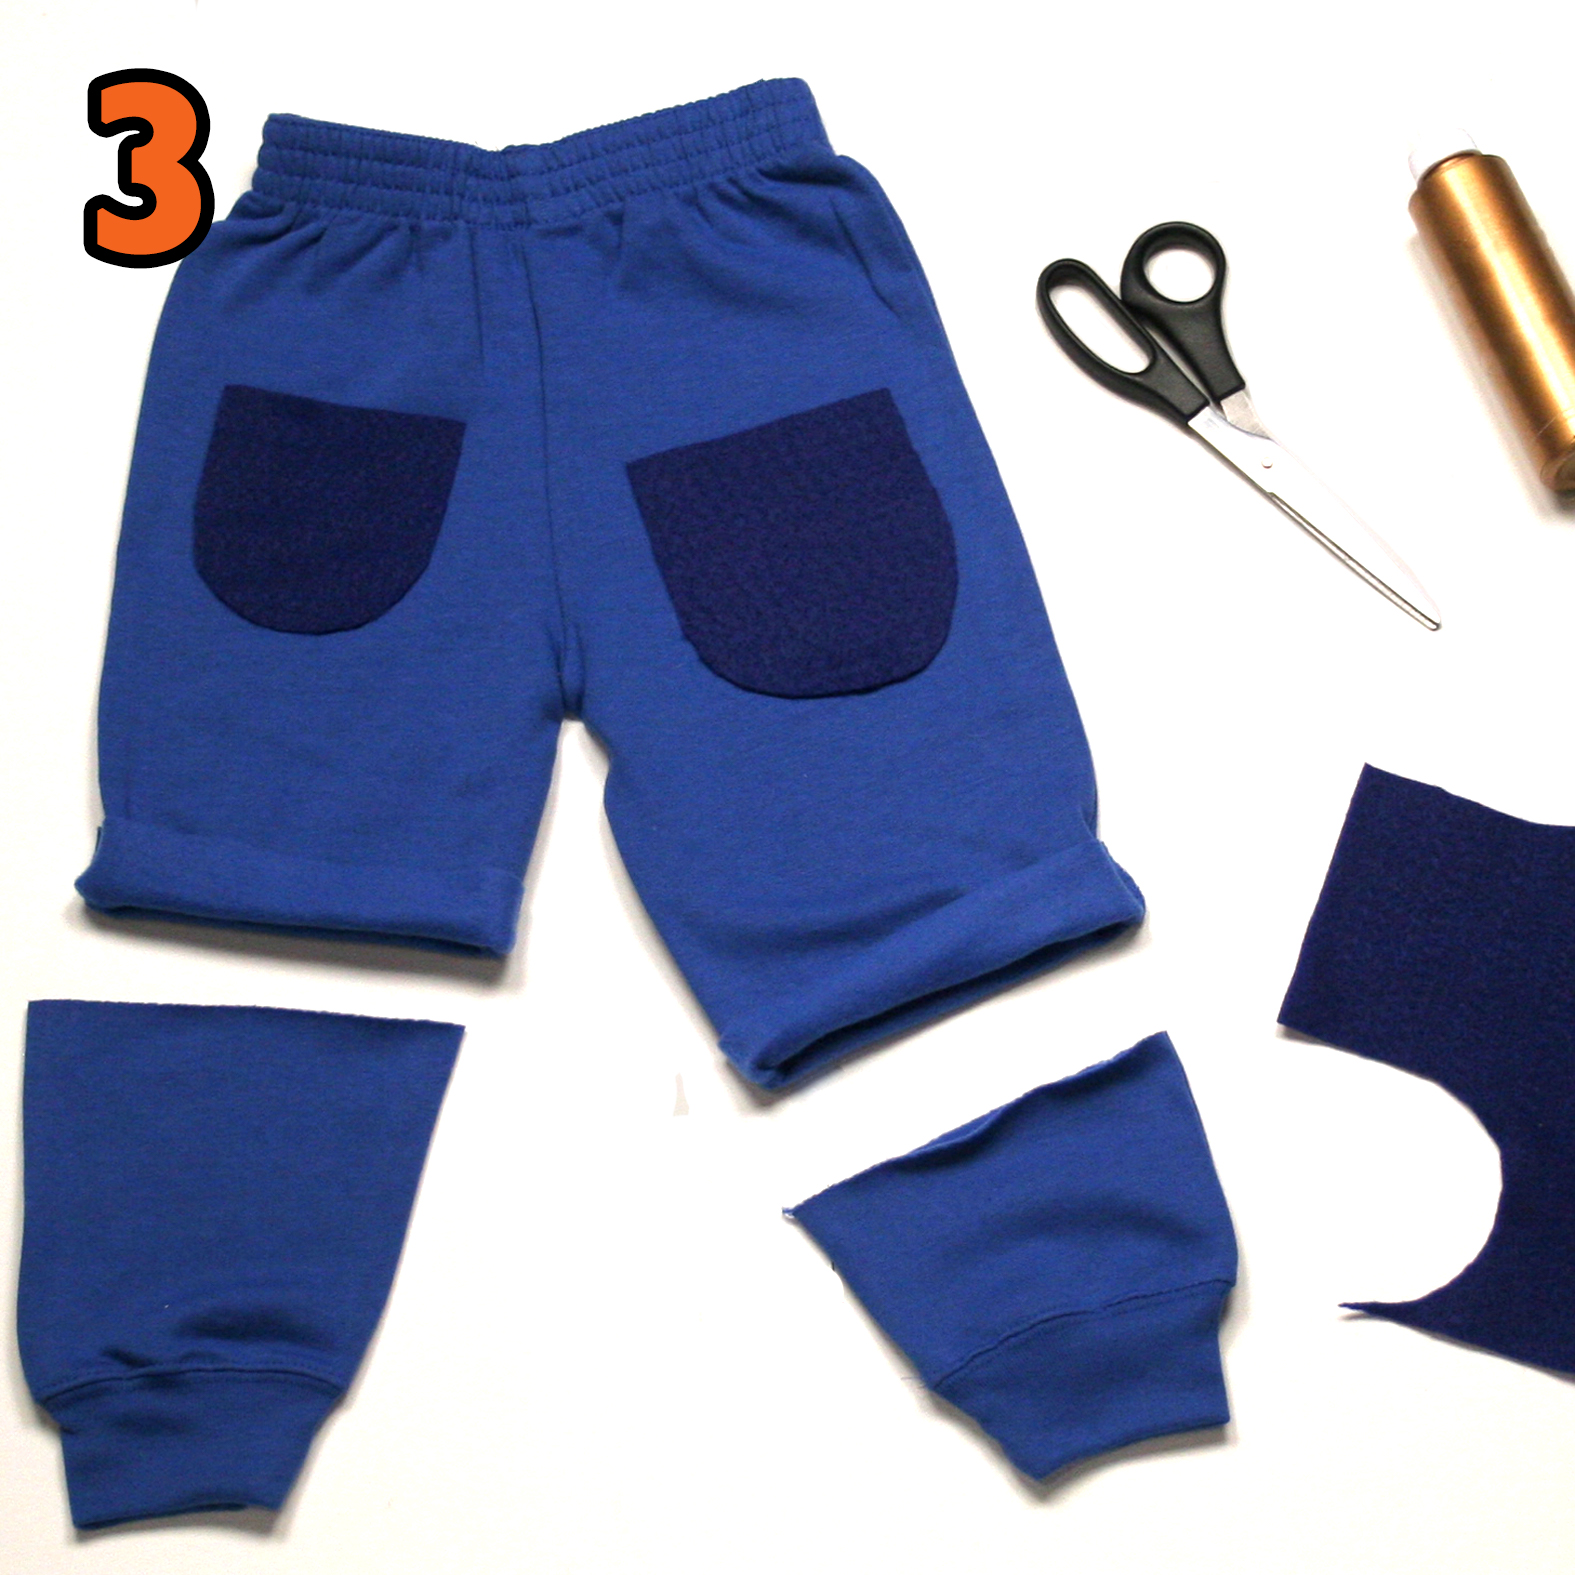 Jack costume step 3